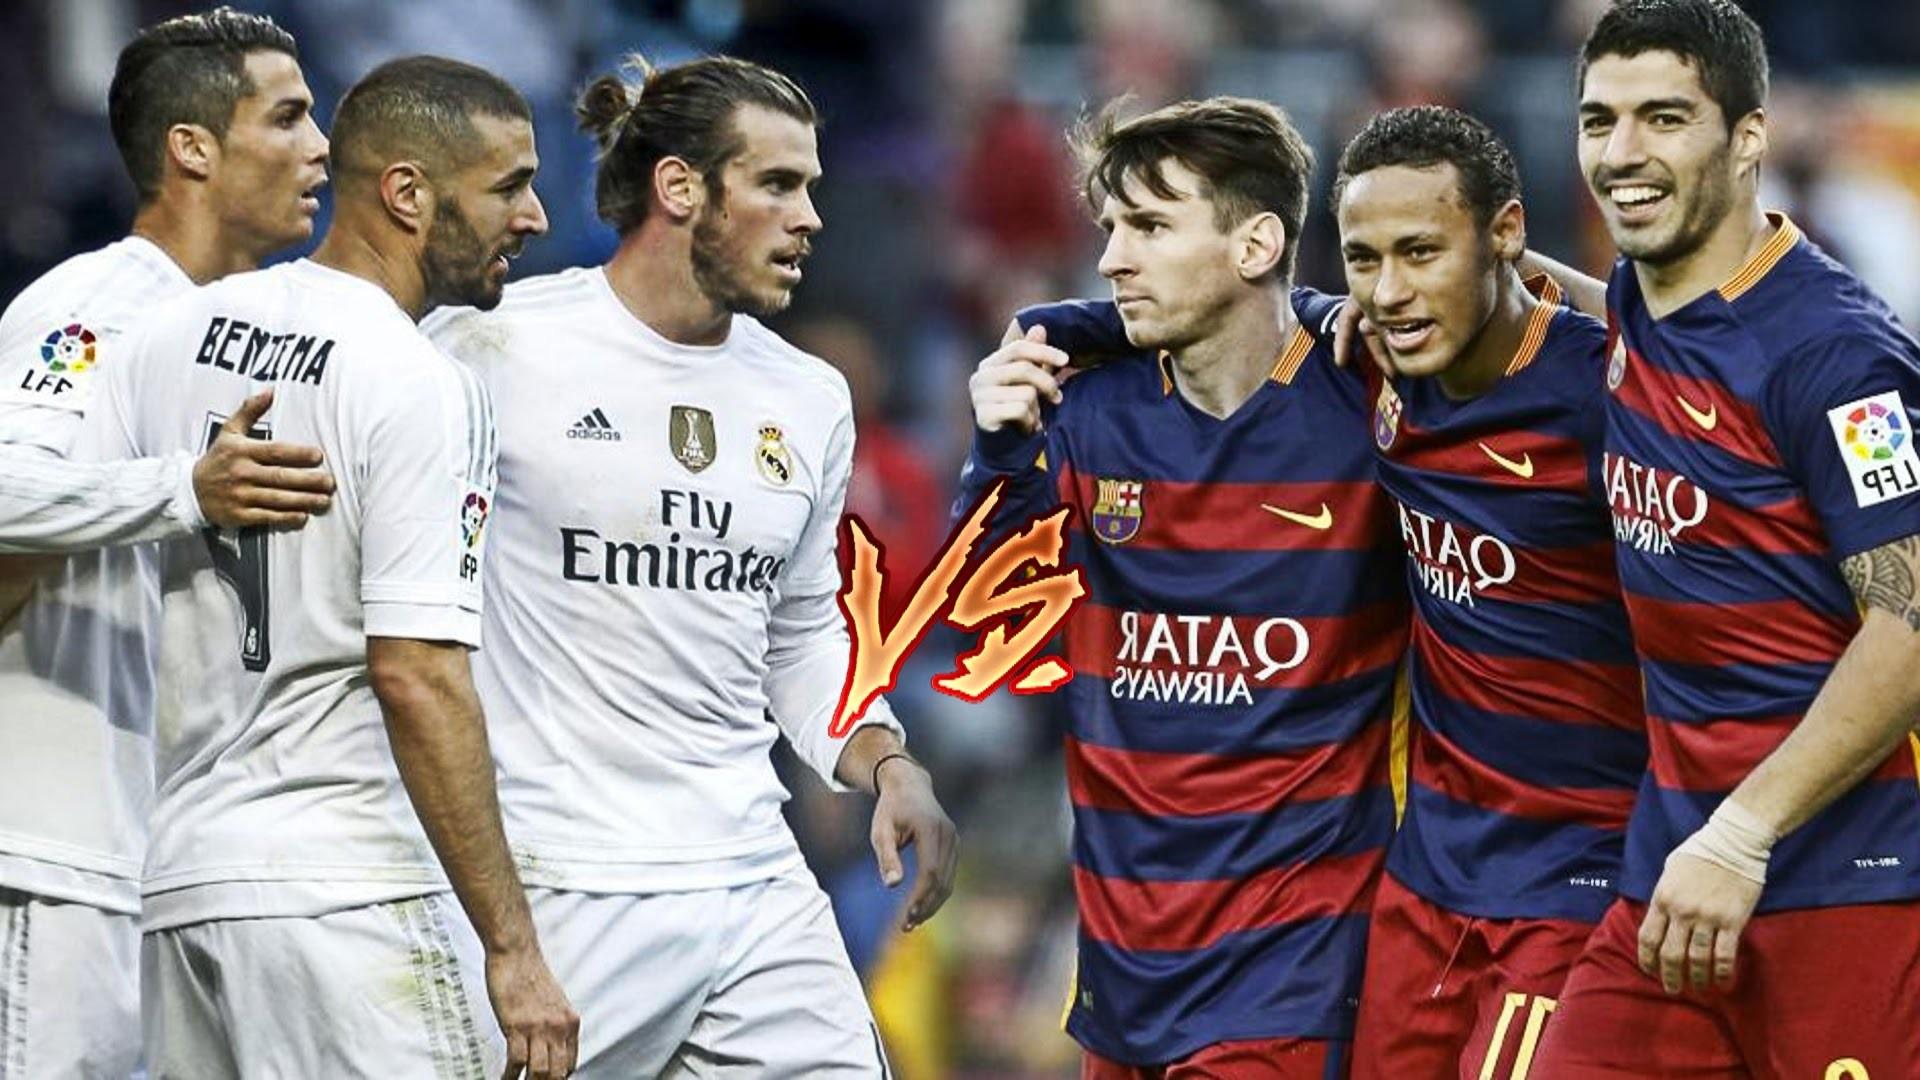 Bale, Benzema, C.Ronaldo vs Messi, Suarez, Neymar   BBC vs